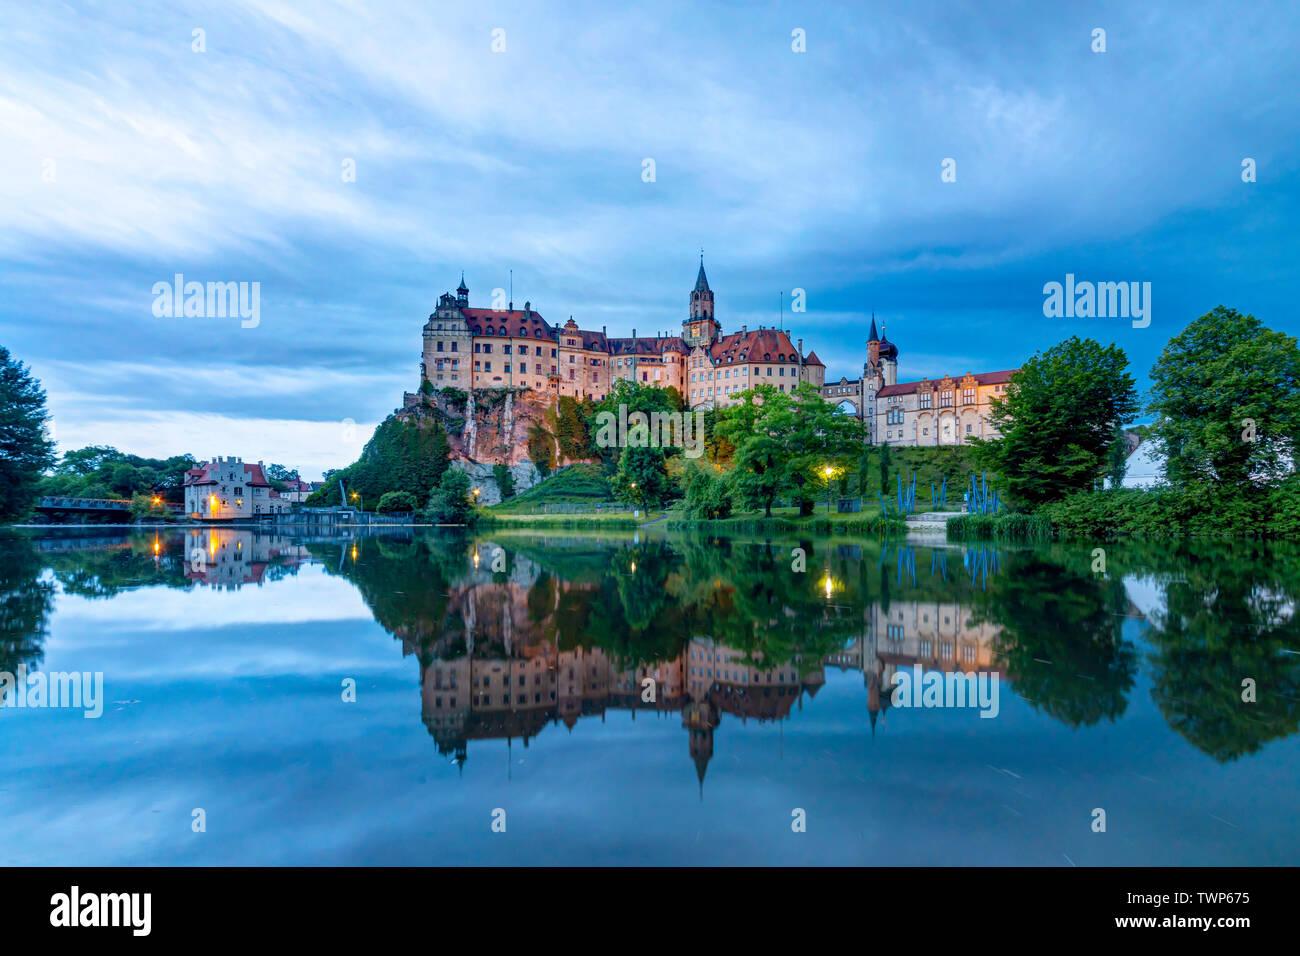 Hohenzollern Castle, Schloss, Sigmaringen, Baden-Württemberg Stock Photo